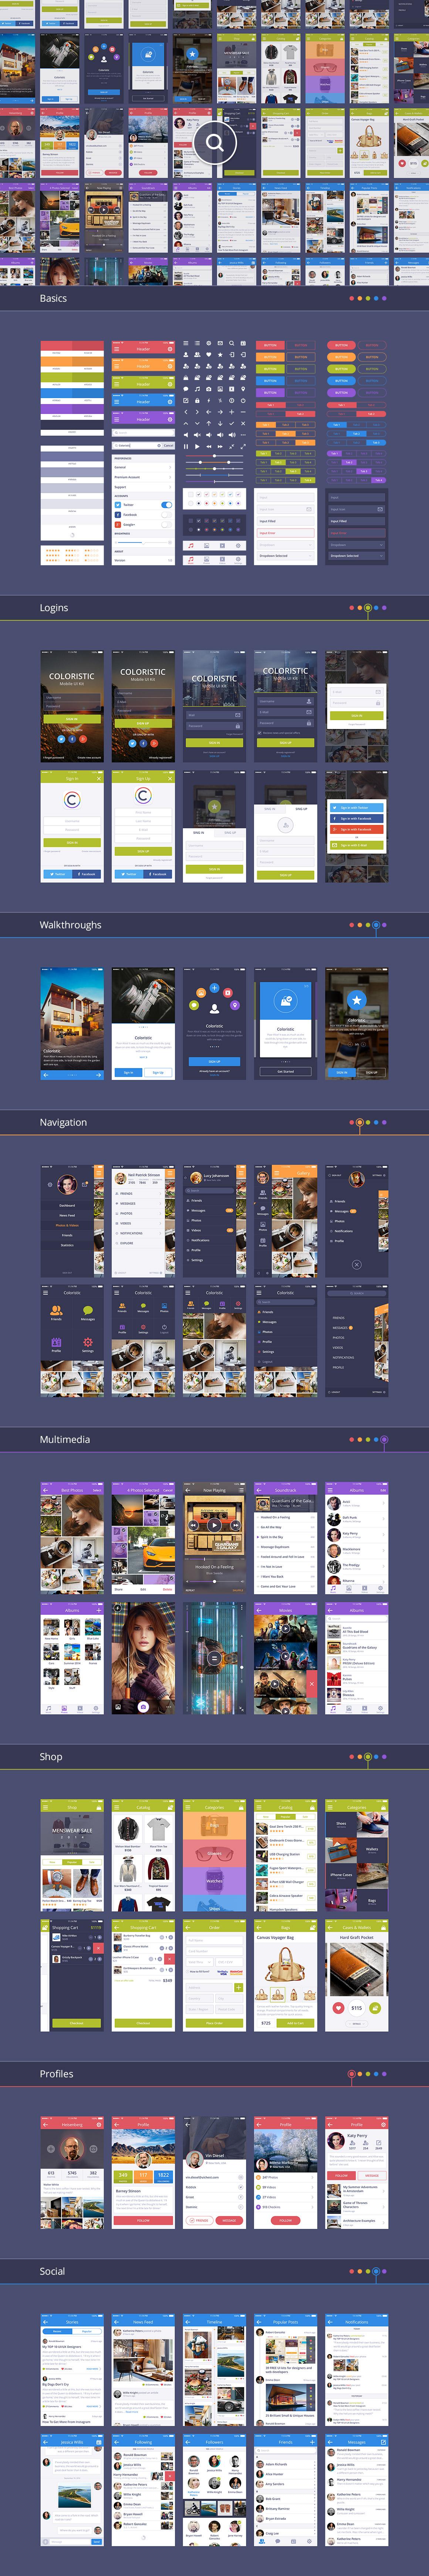 https://d3ui957tjb5bqd.cloudfront.net/images/screenshots/products/43/430/430917/coloristic_preview_02-o.jpg?1428061413